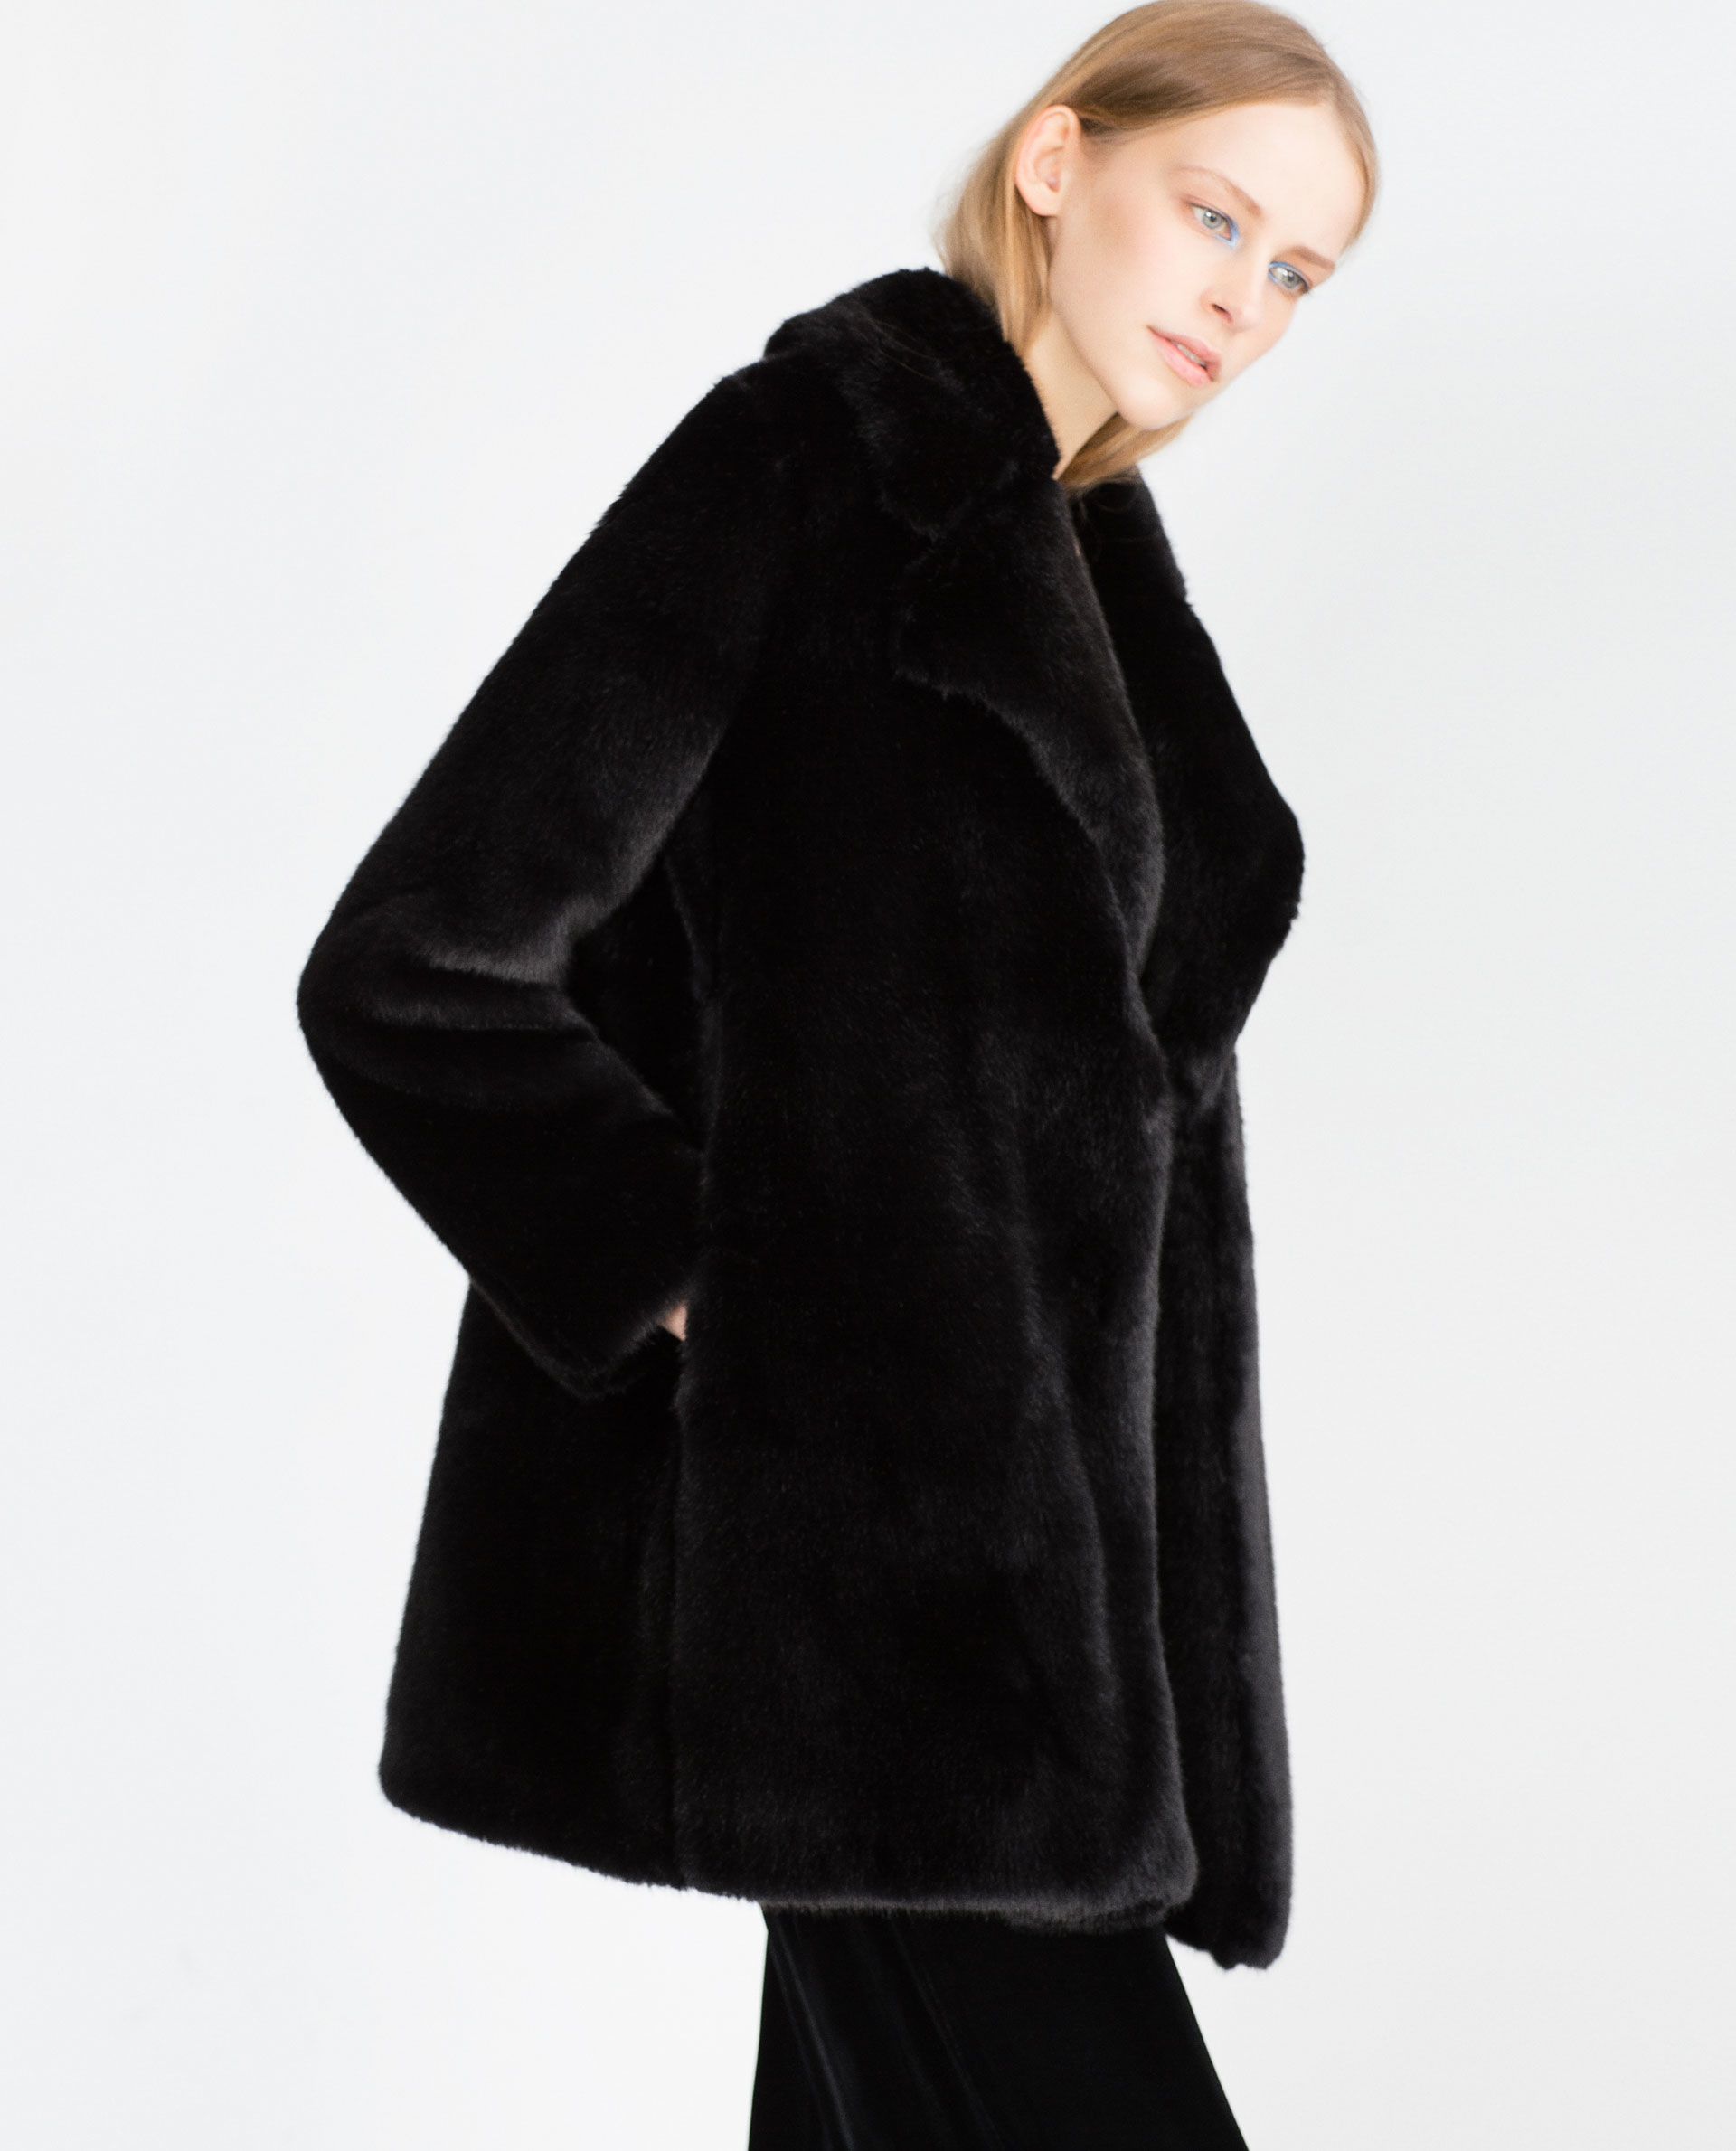 Black Faux Fur Coat Photo Album - Reikian